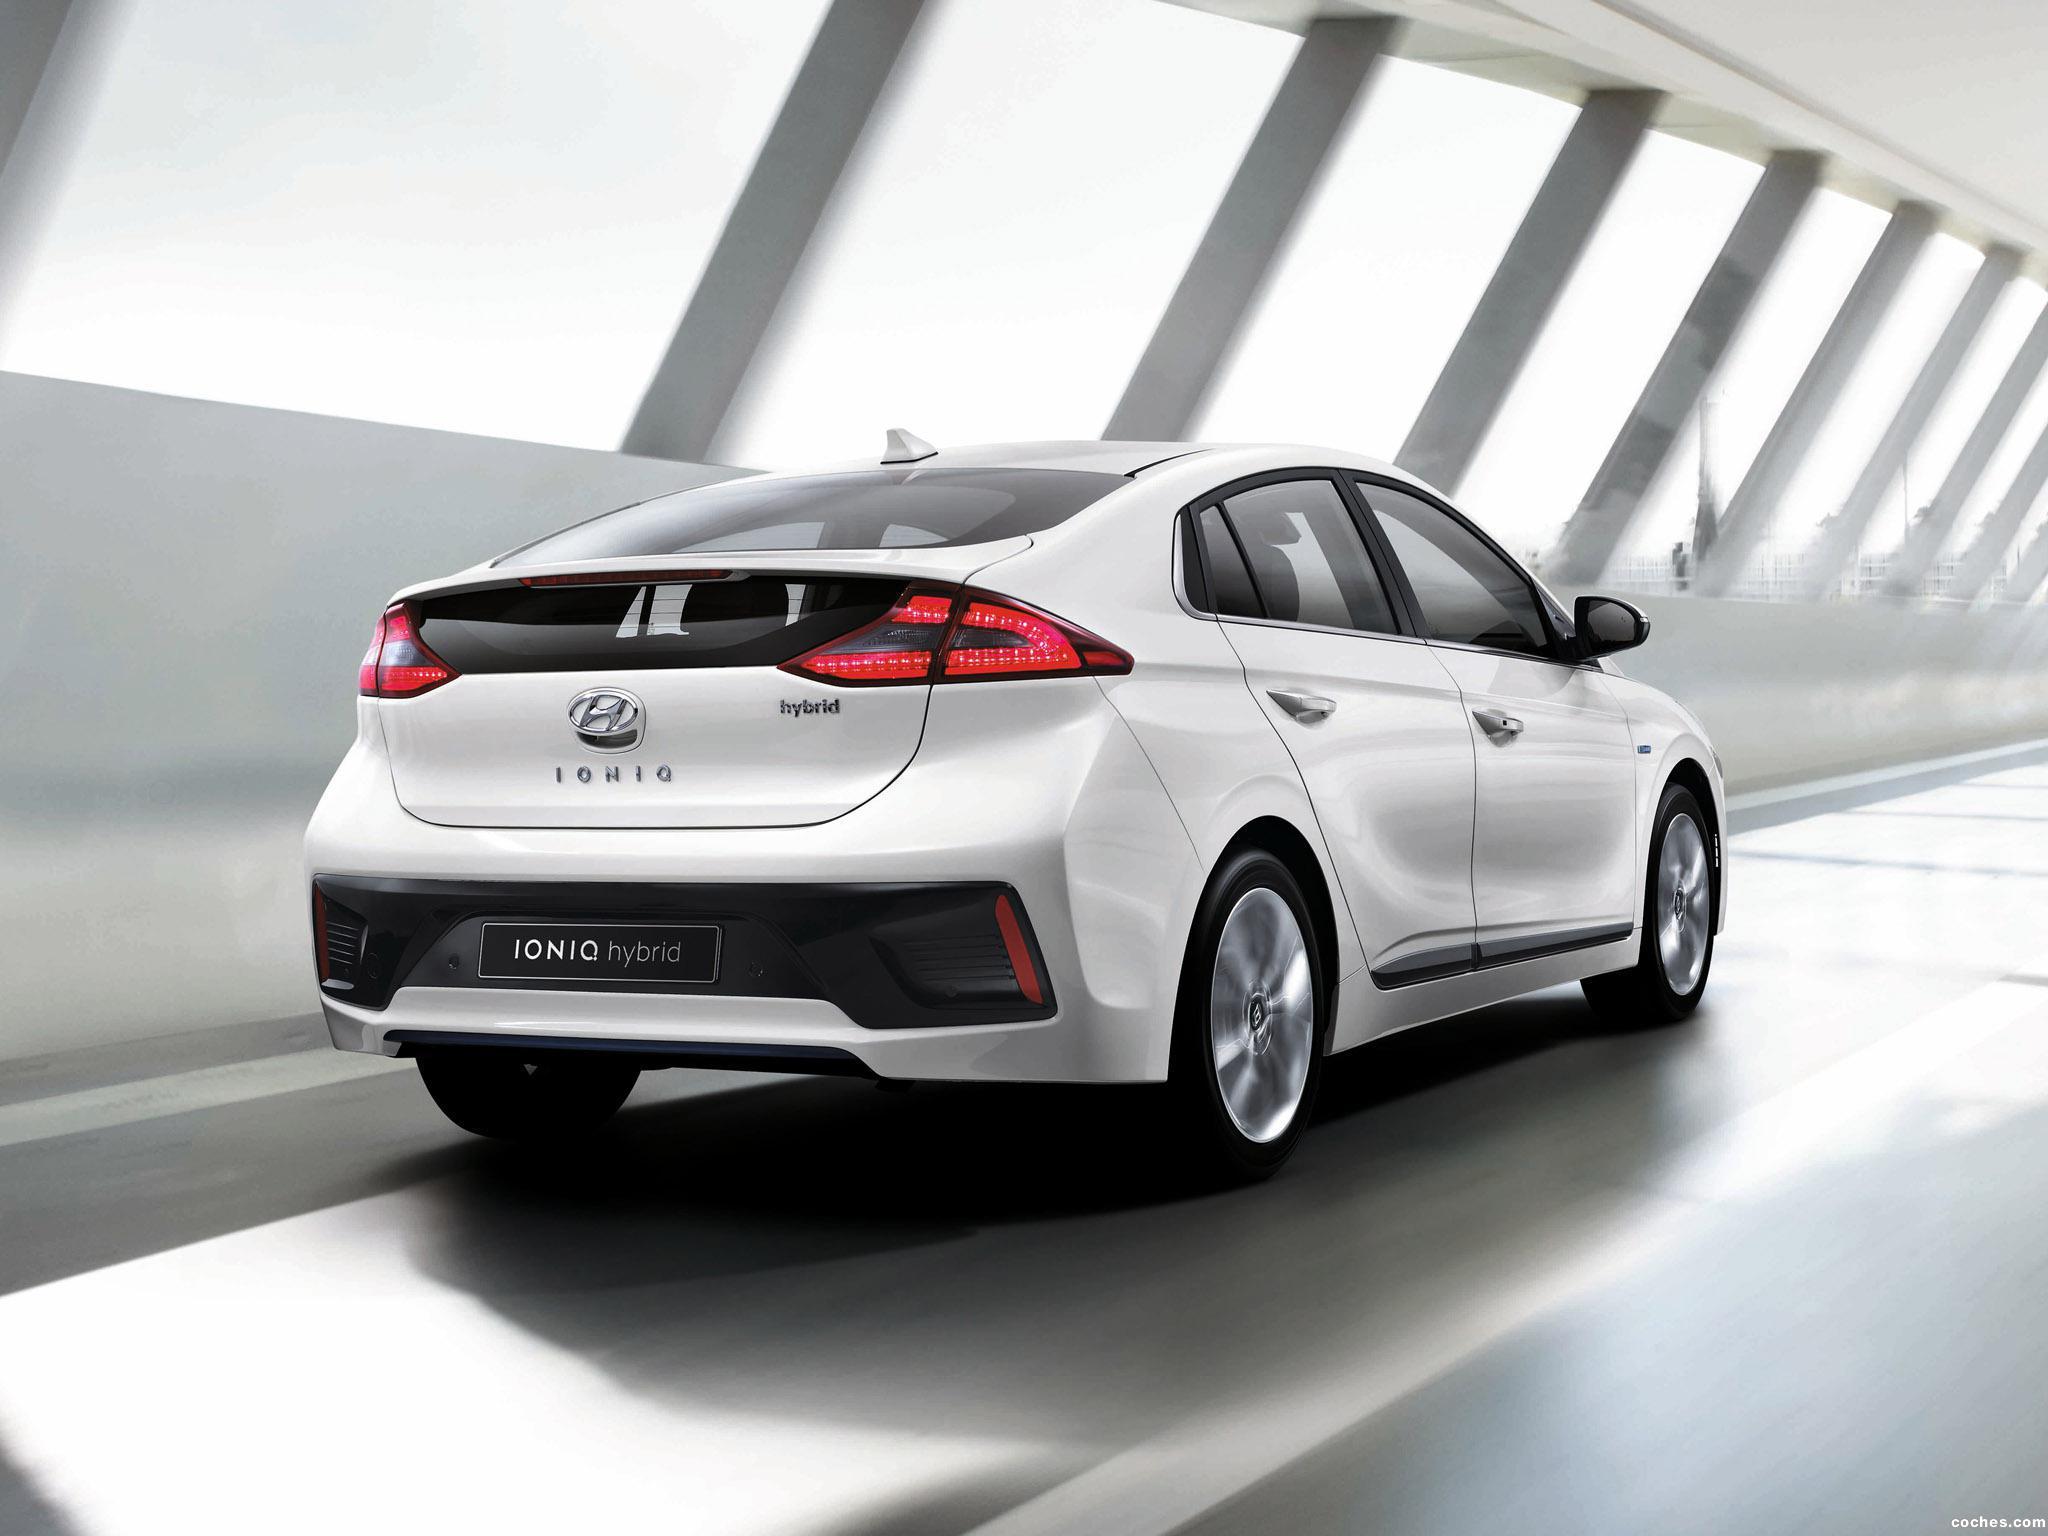 Foto 1 de Hyundai IONIQ Hybrid 2016